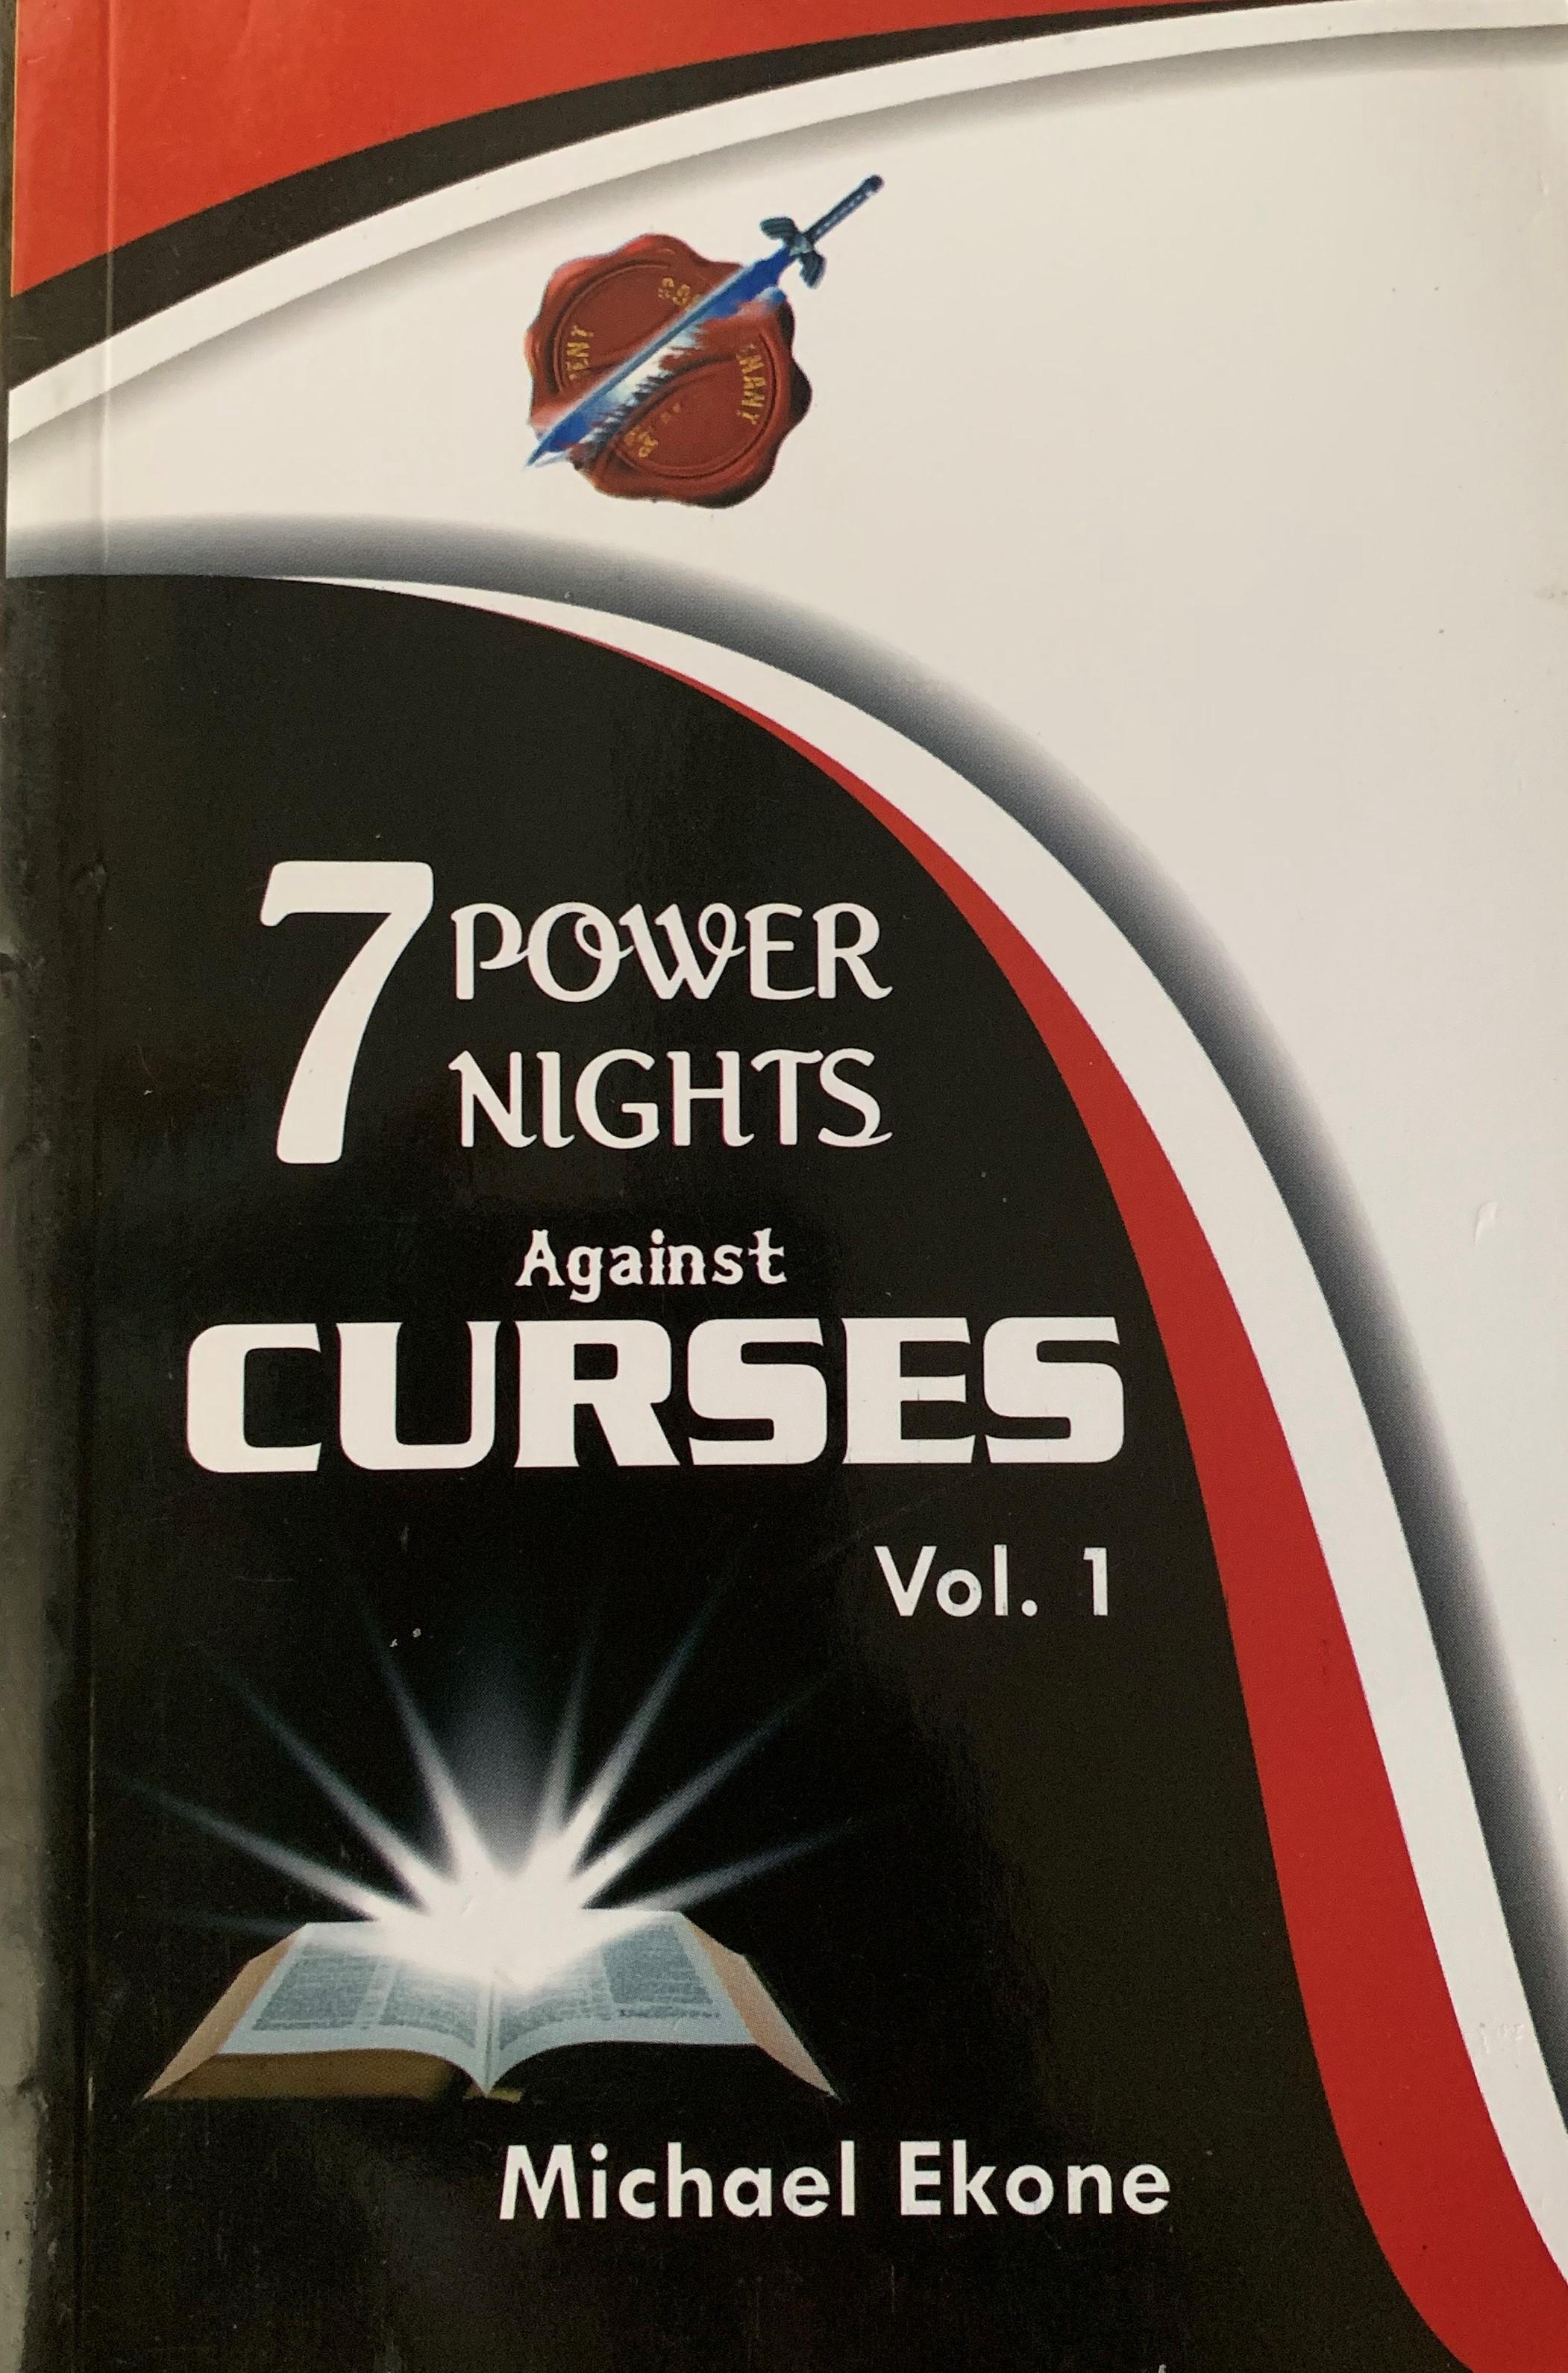 7 Power Nights Against Curses Vol 1-- Michael Ekone